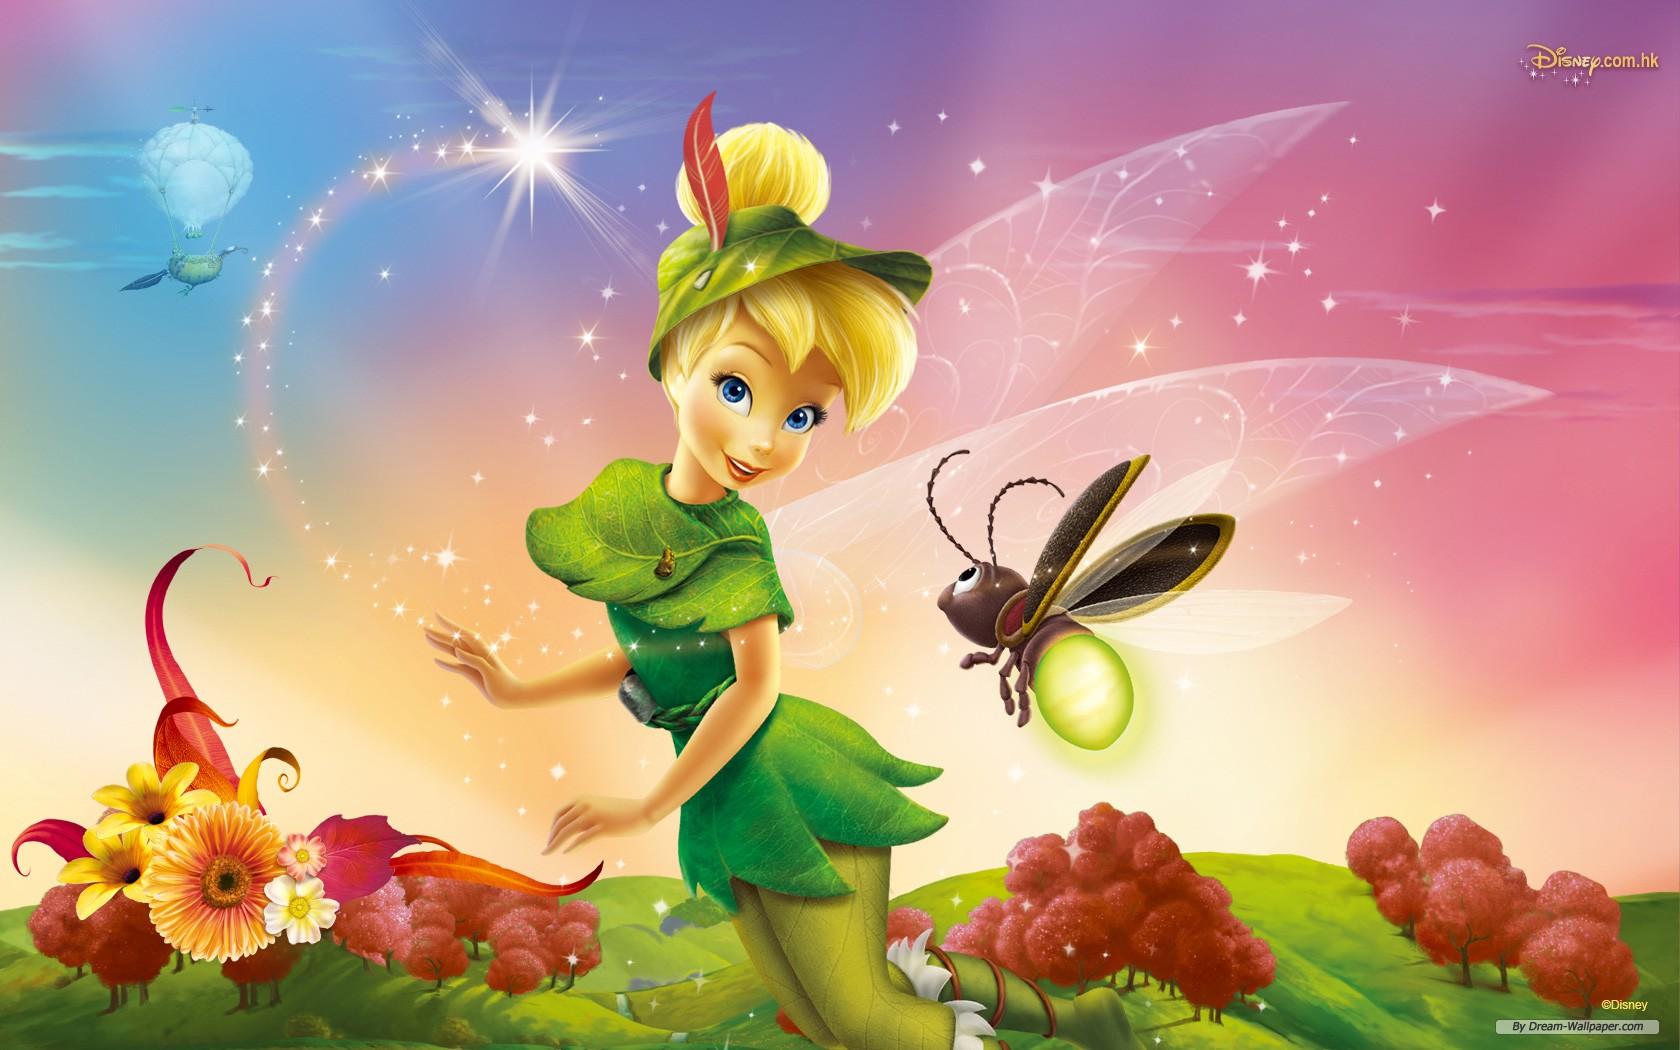 Cartoon Wallpaper Disney Princess 3 Wallpaper 1680x1050